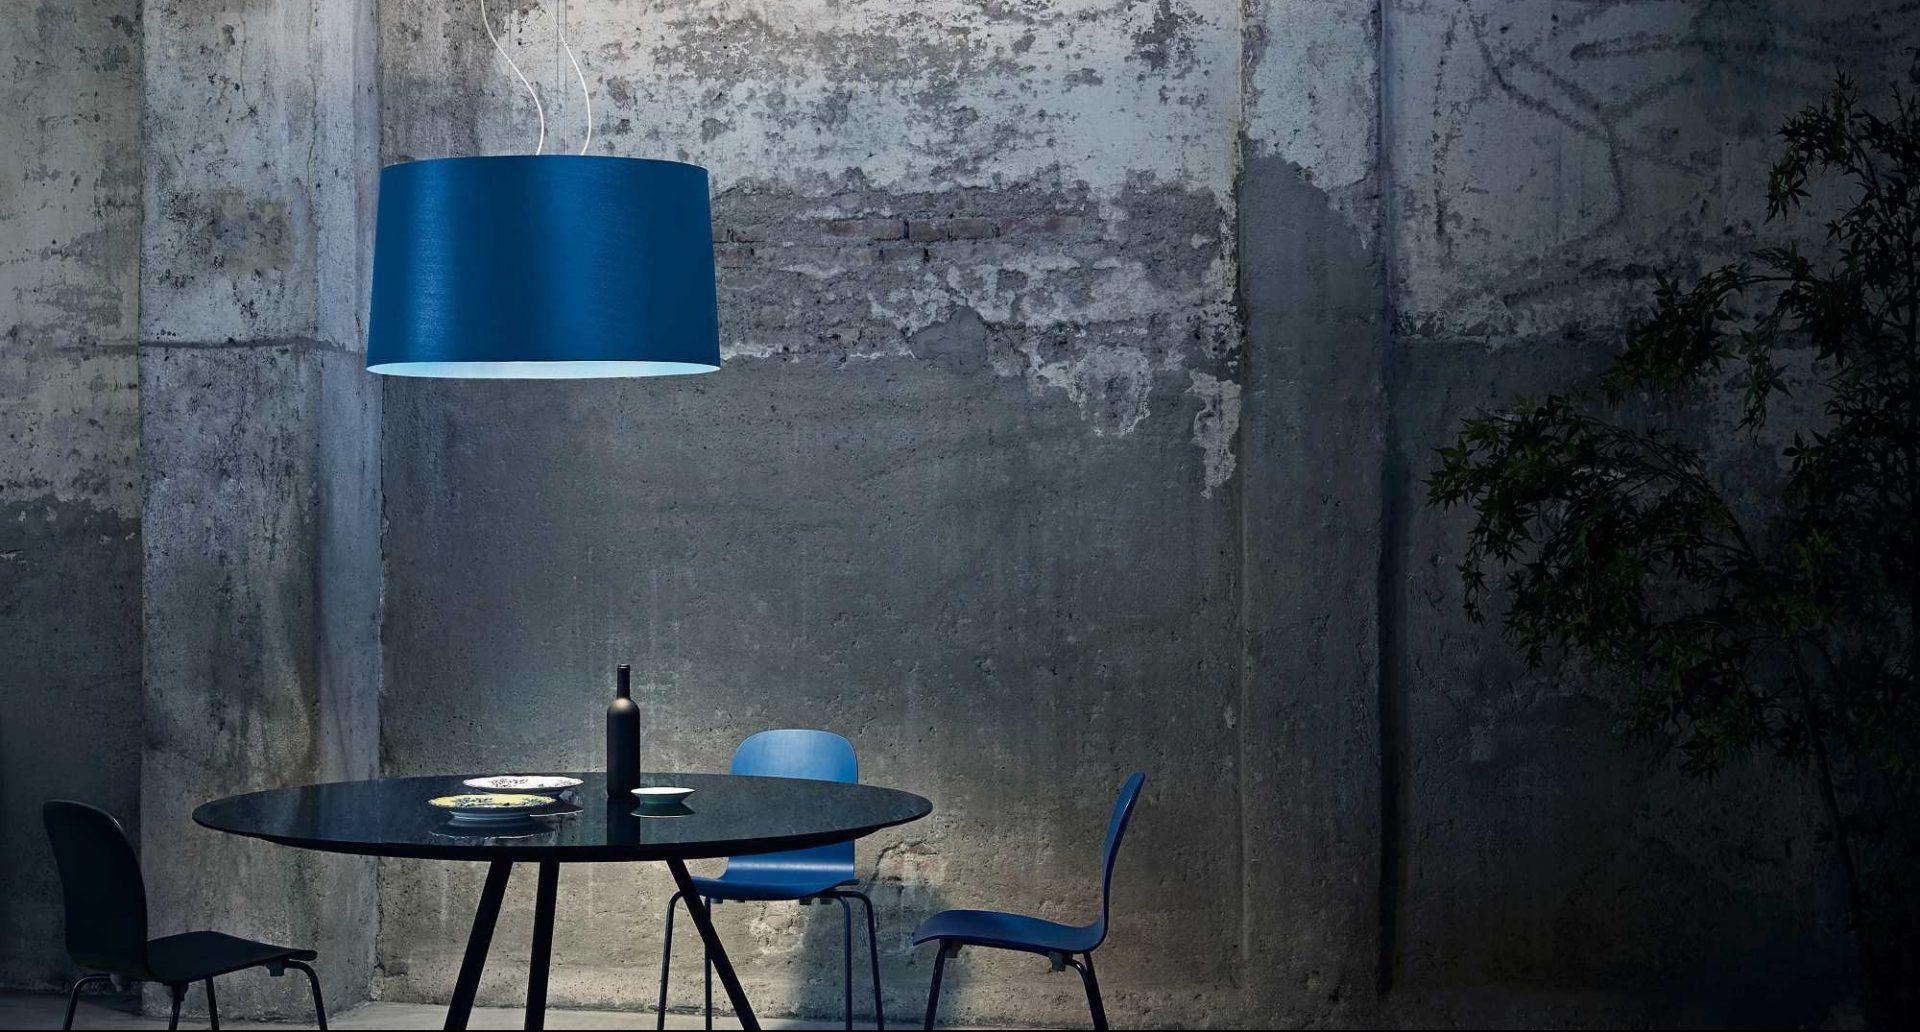 Lampen Foscarini Caboche : Foscarini caboche hängeleuchte shop i design bestseller